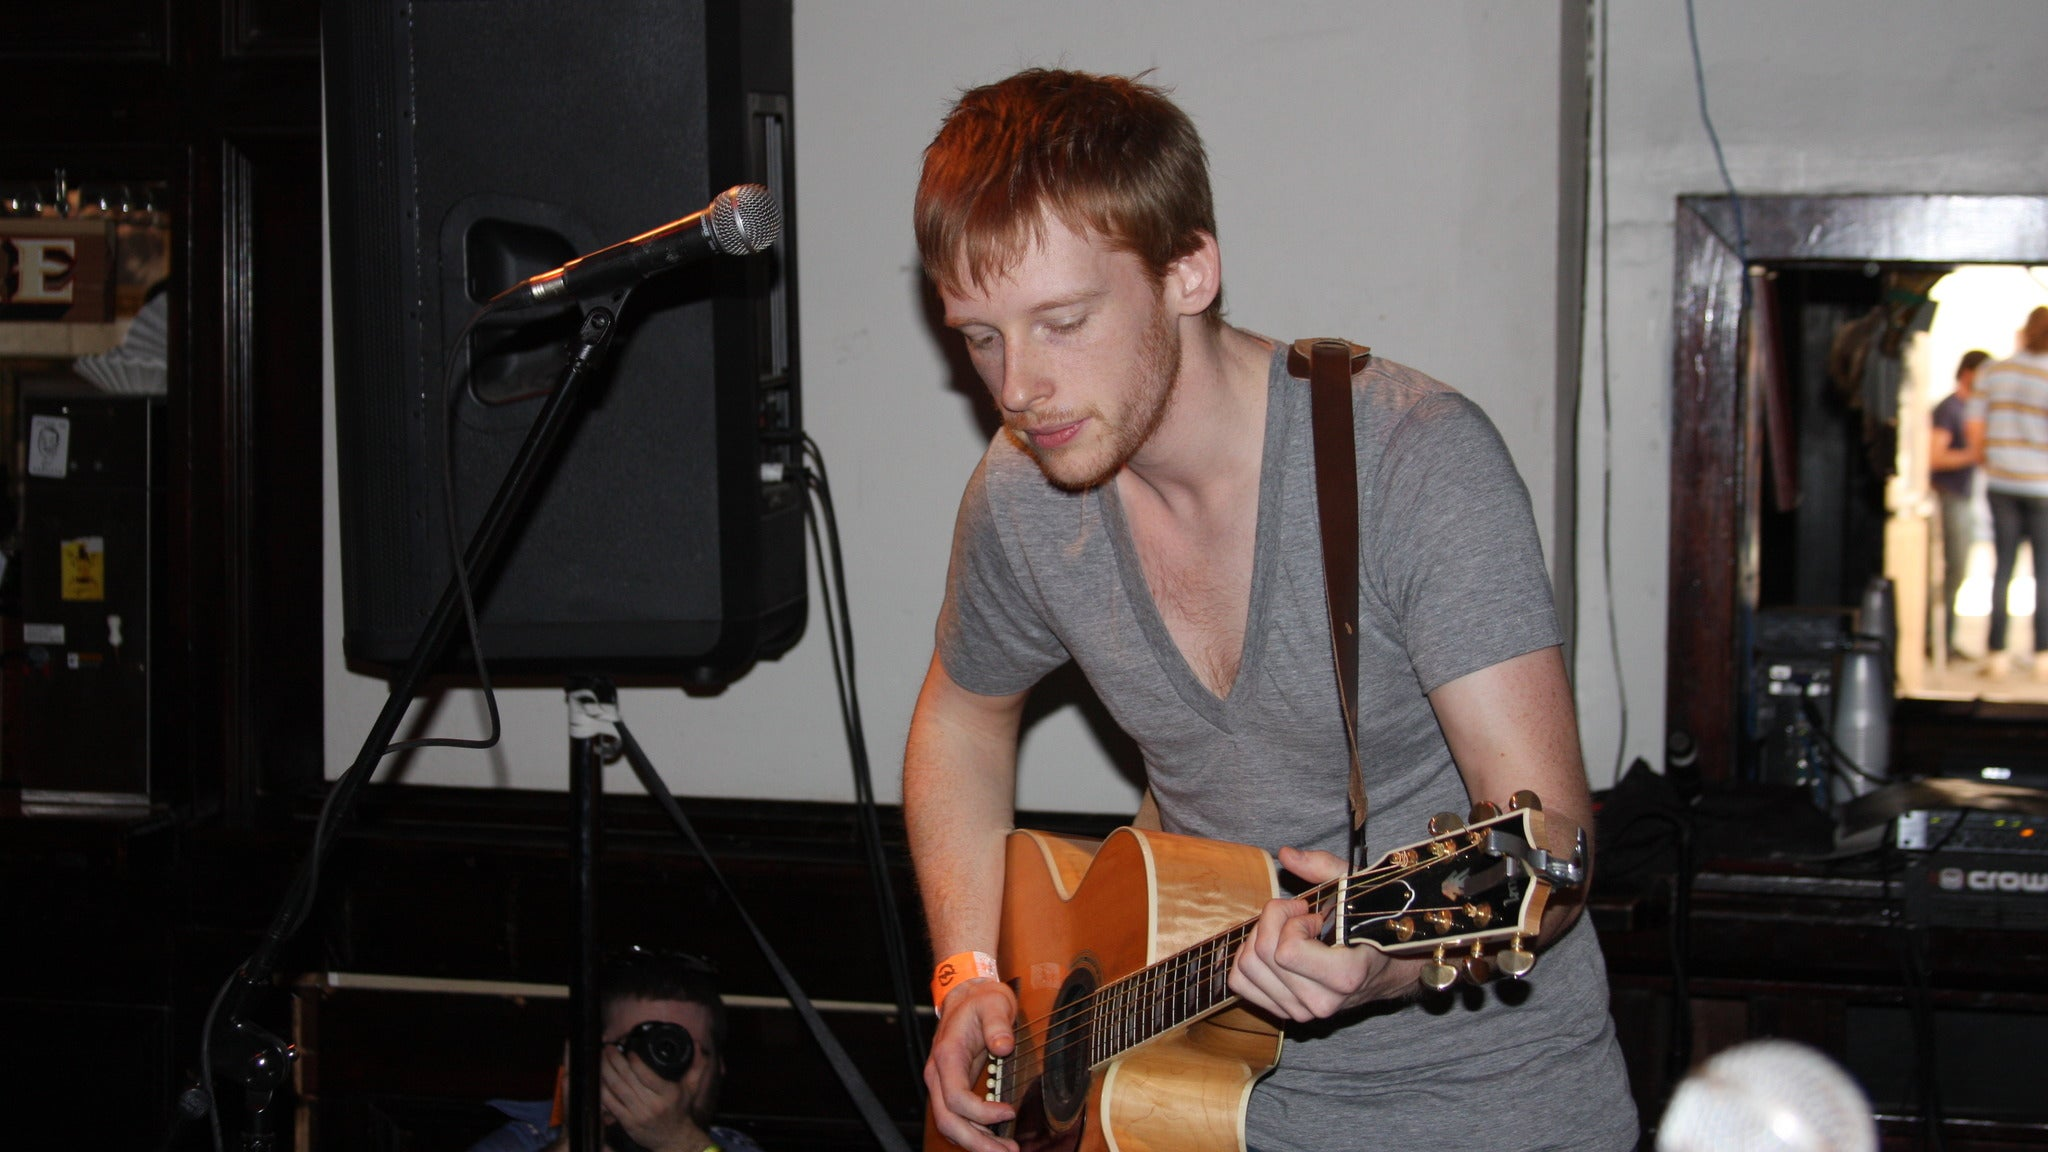 Kevin Devine at Masquerade - Atlanta, GA 30308